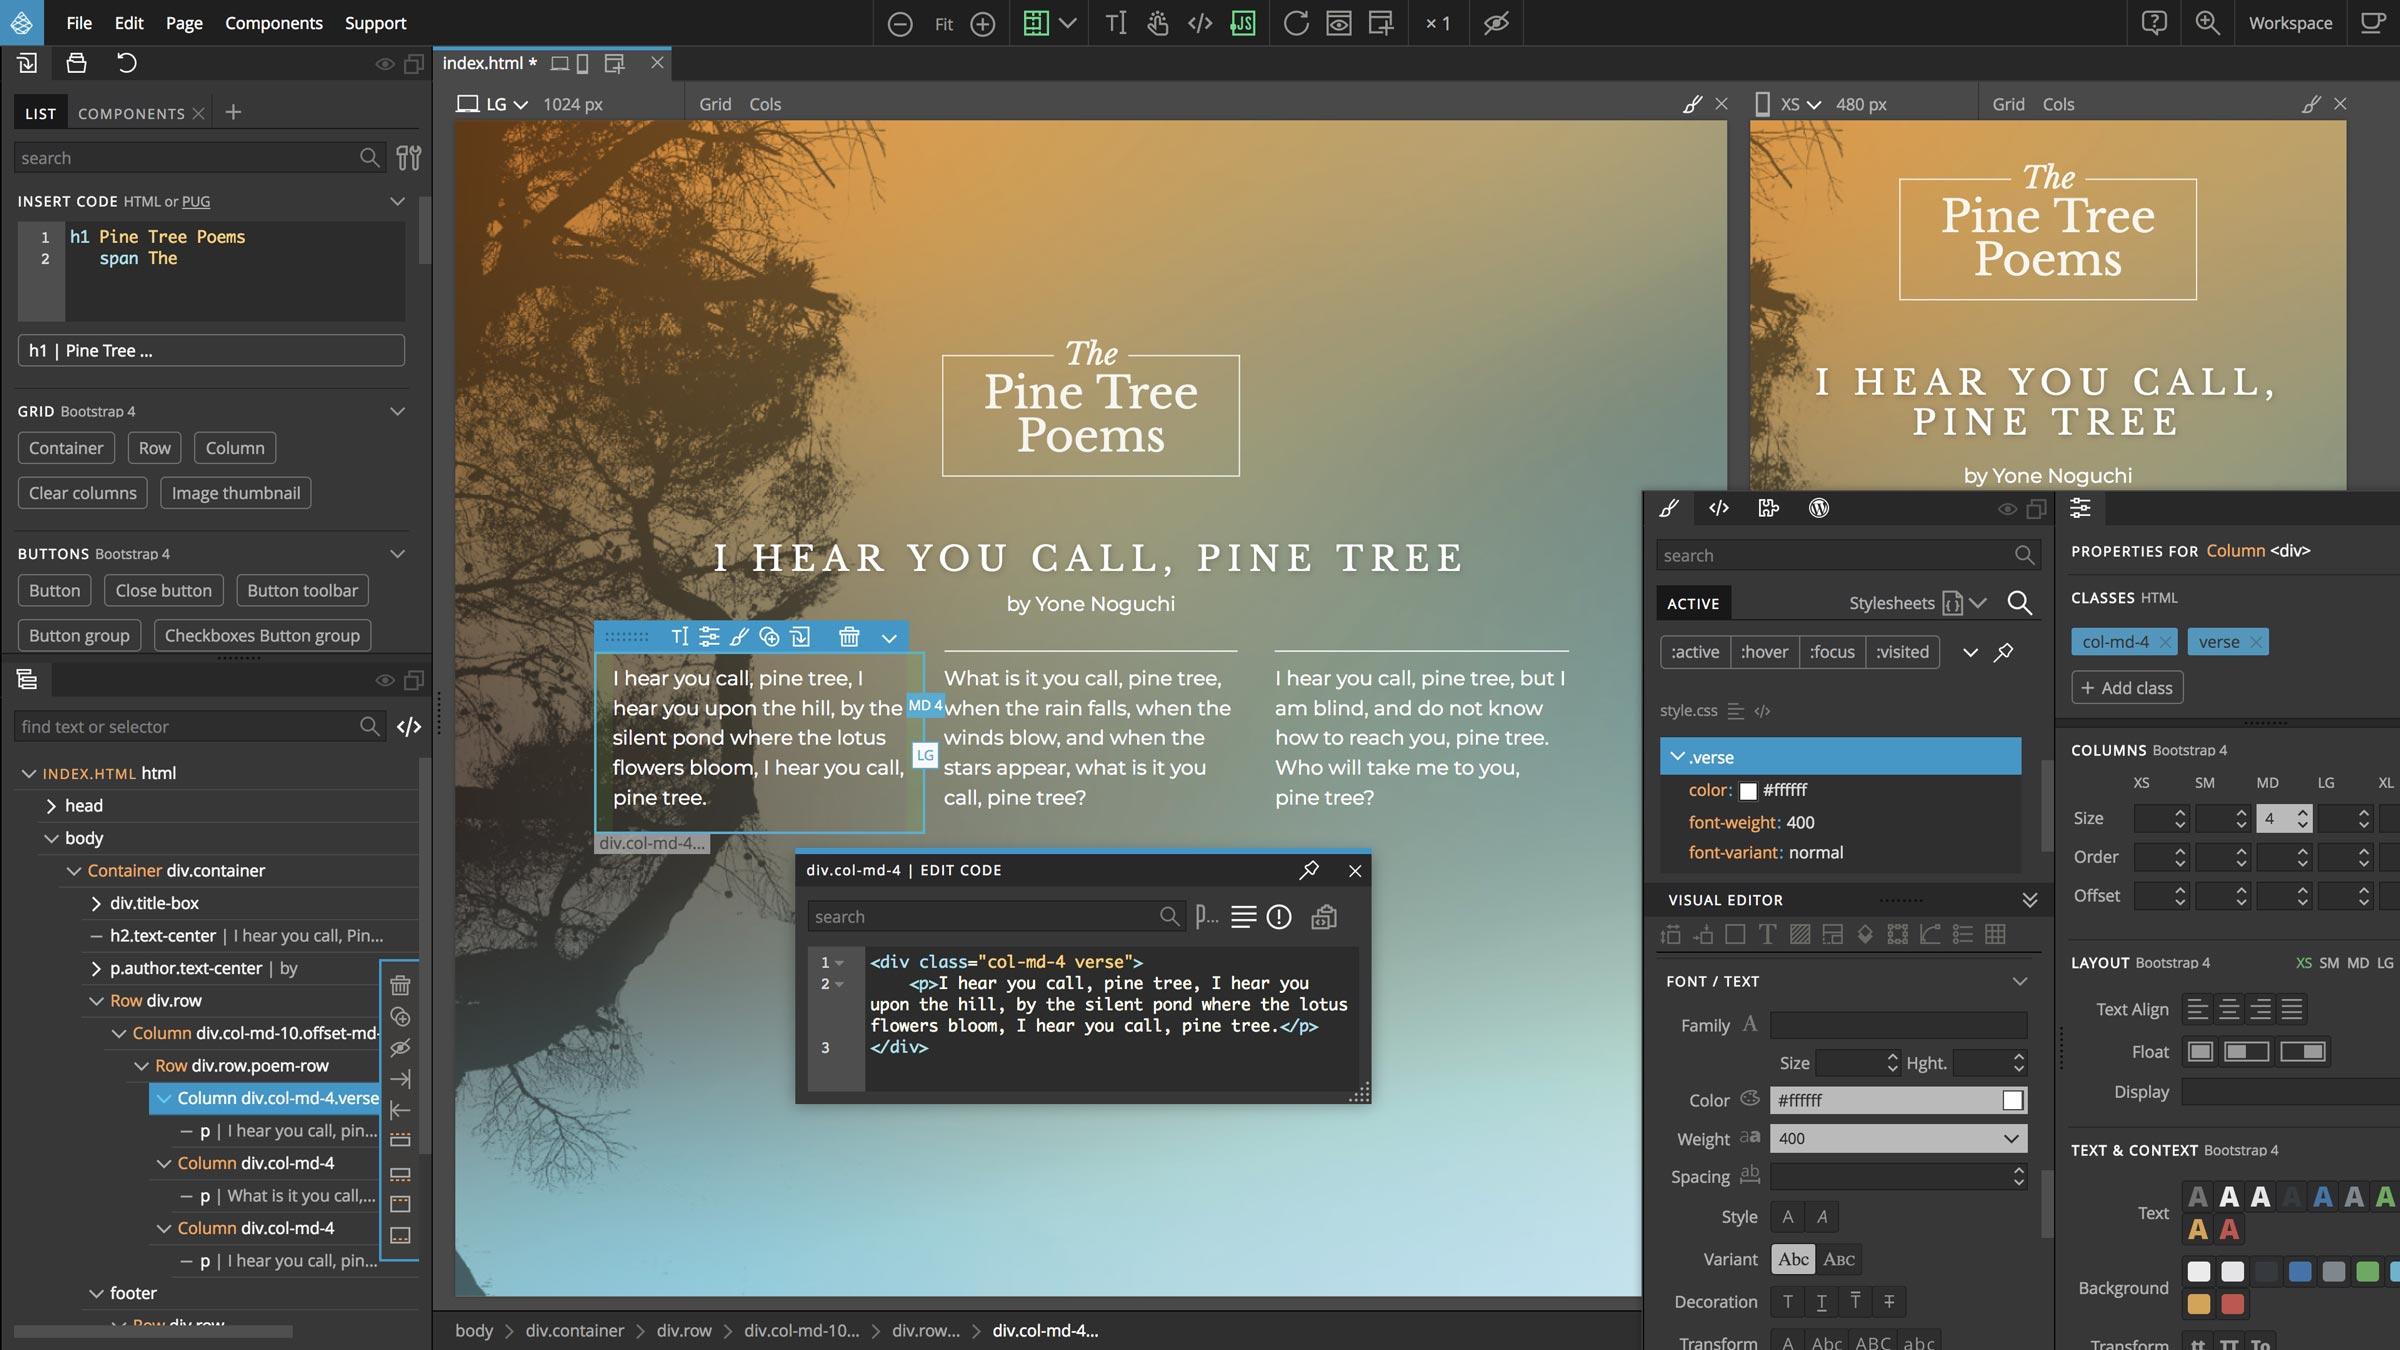 Humane Technologies Pinegrow Web Editor Pro v5.7